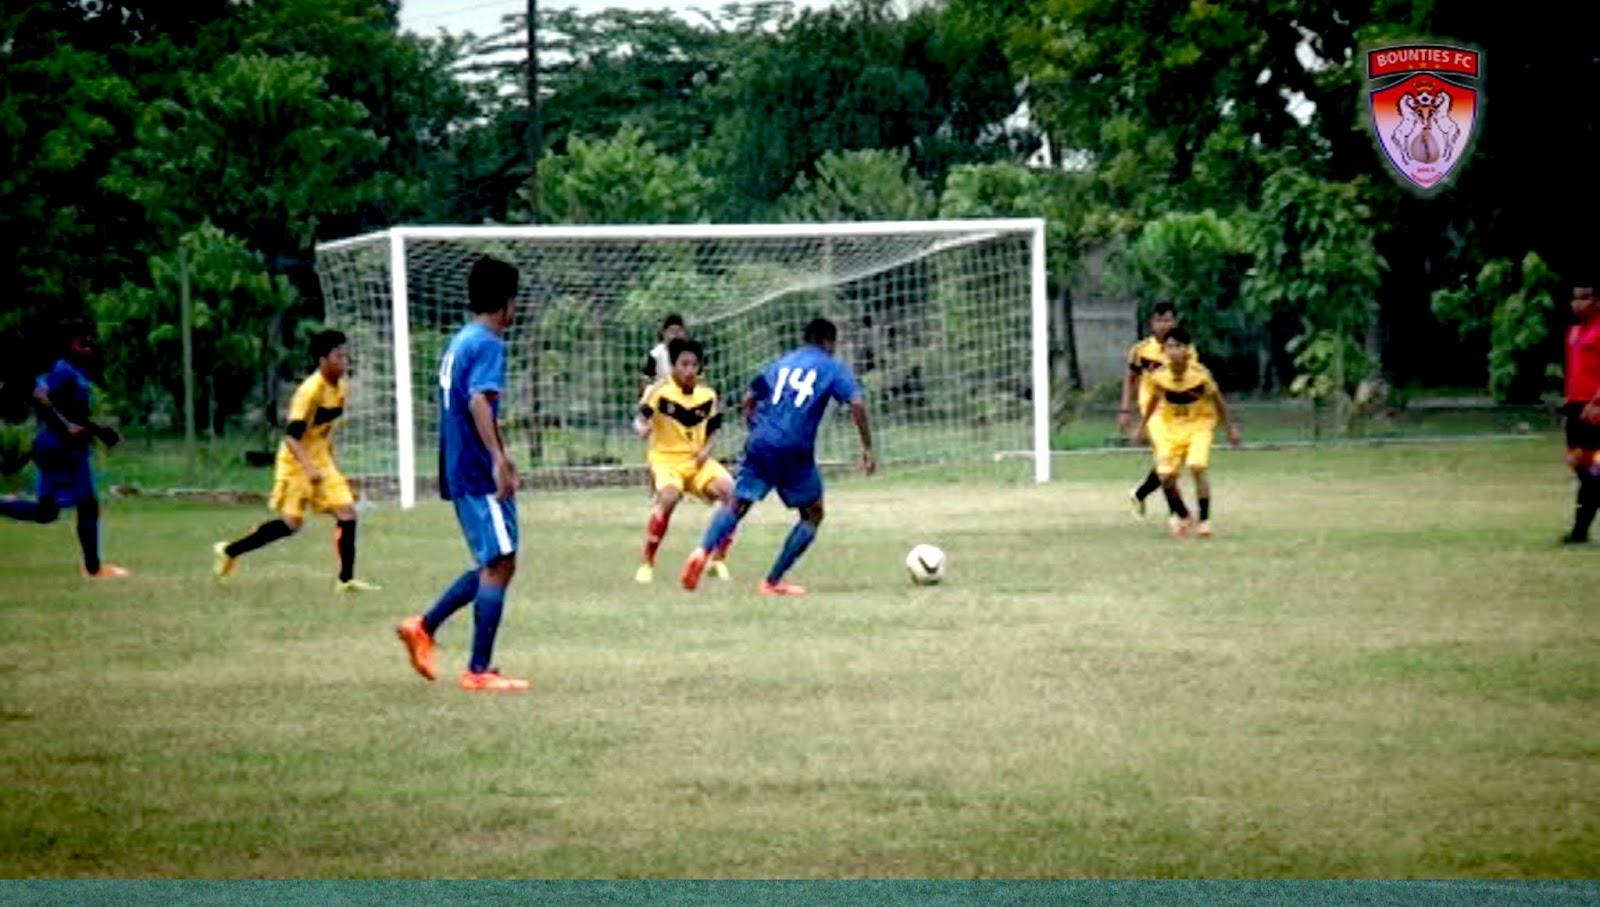 Pertandingan Sepak Bola Bounties FC Di Bogor ~ BOUNTIES FC